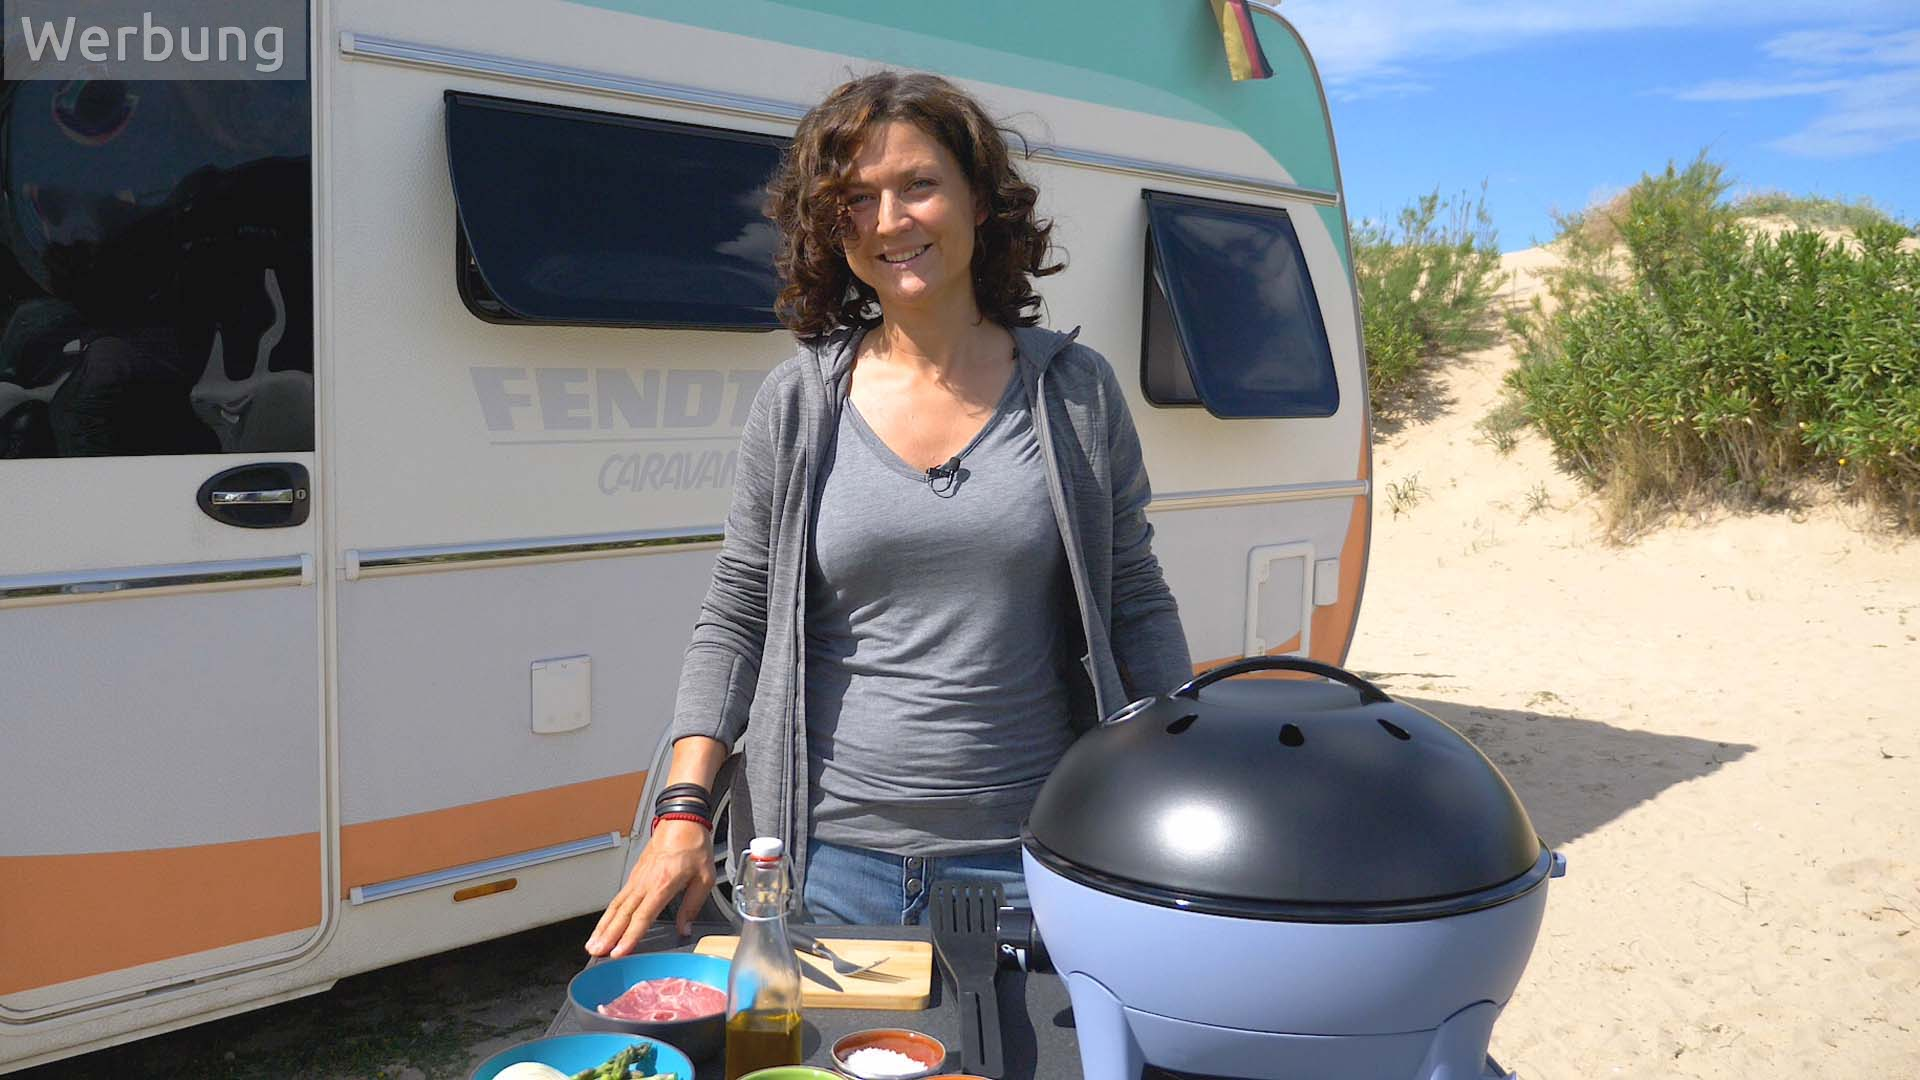 Camping-Rezepte: Lammkoteletts mit grünem Spargel vom Citi Chef 40